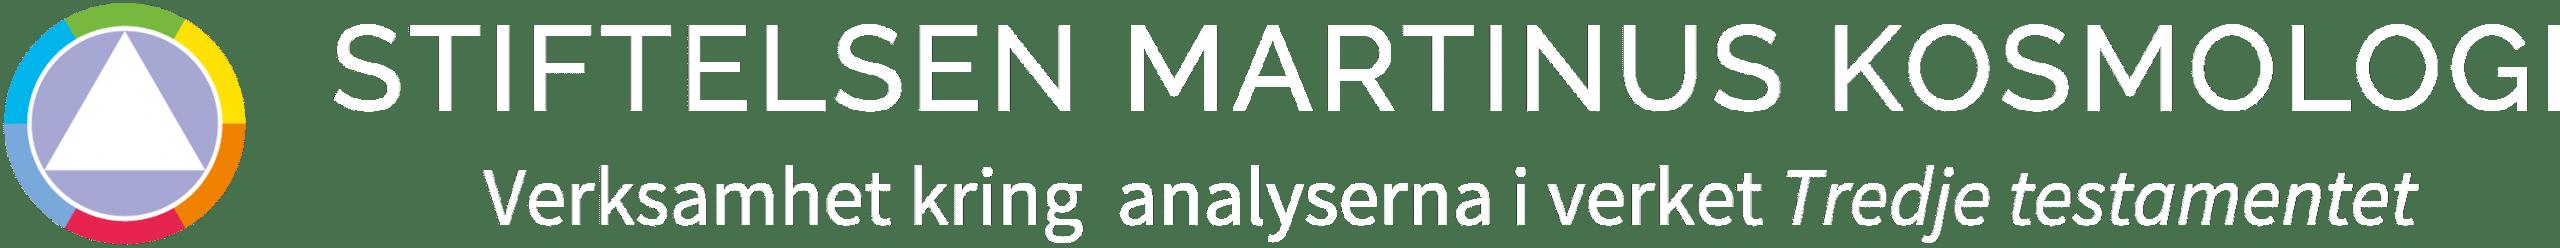 Stiftelsen Martinus Kosmologi